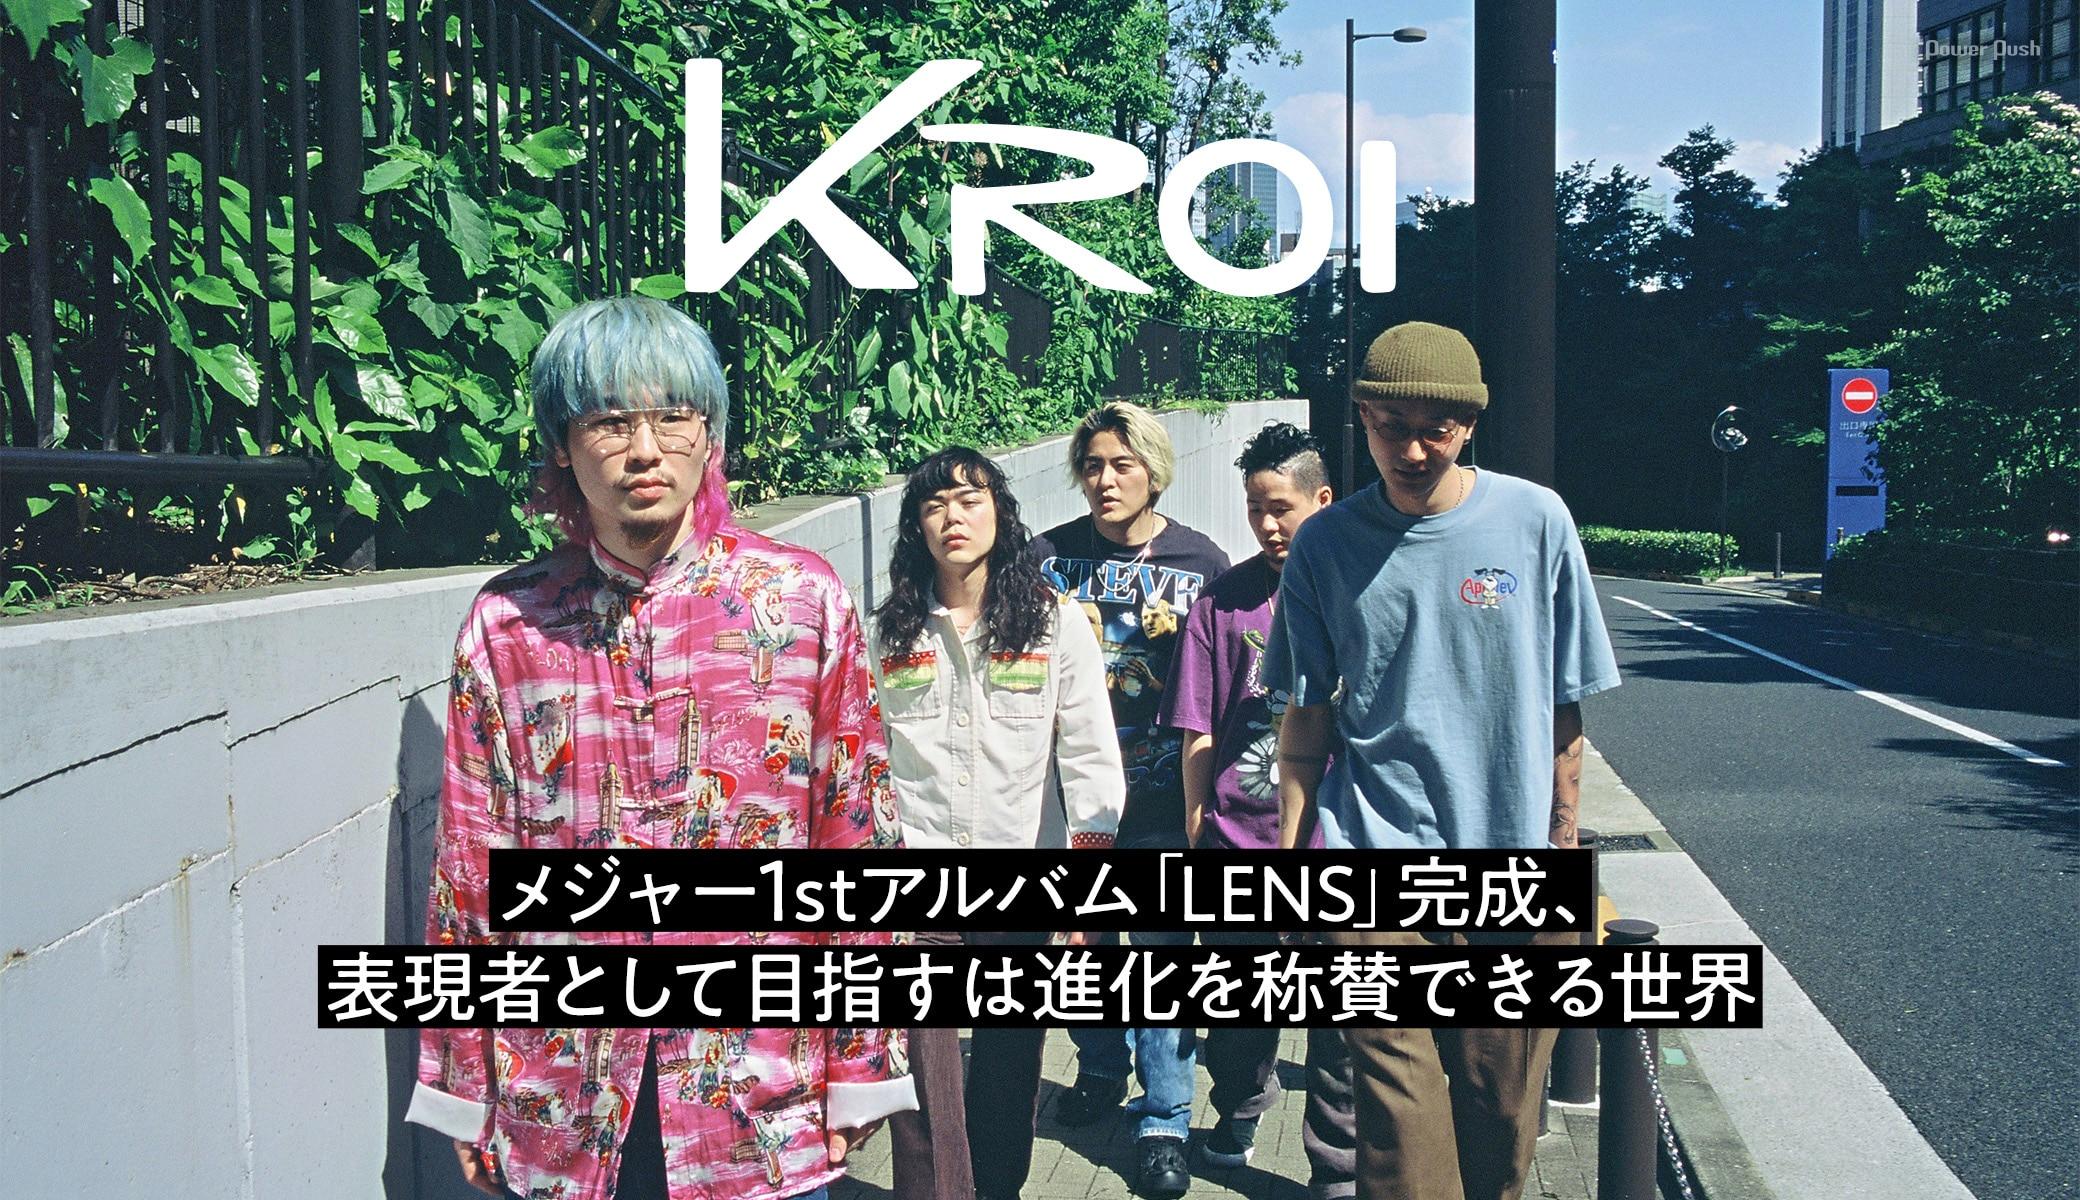 Kroi メジャー1stアルバム「LENS」完成、表現者として目指すは進化を称賛できる世界